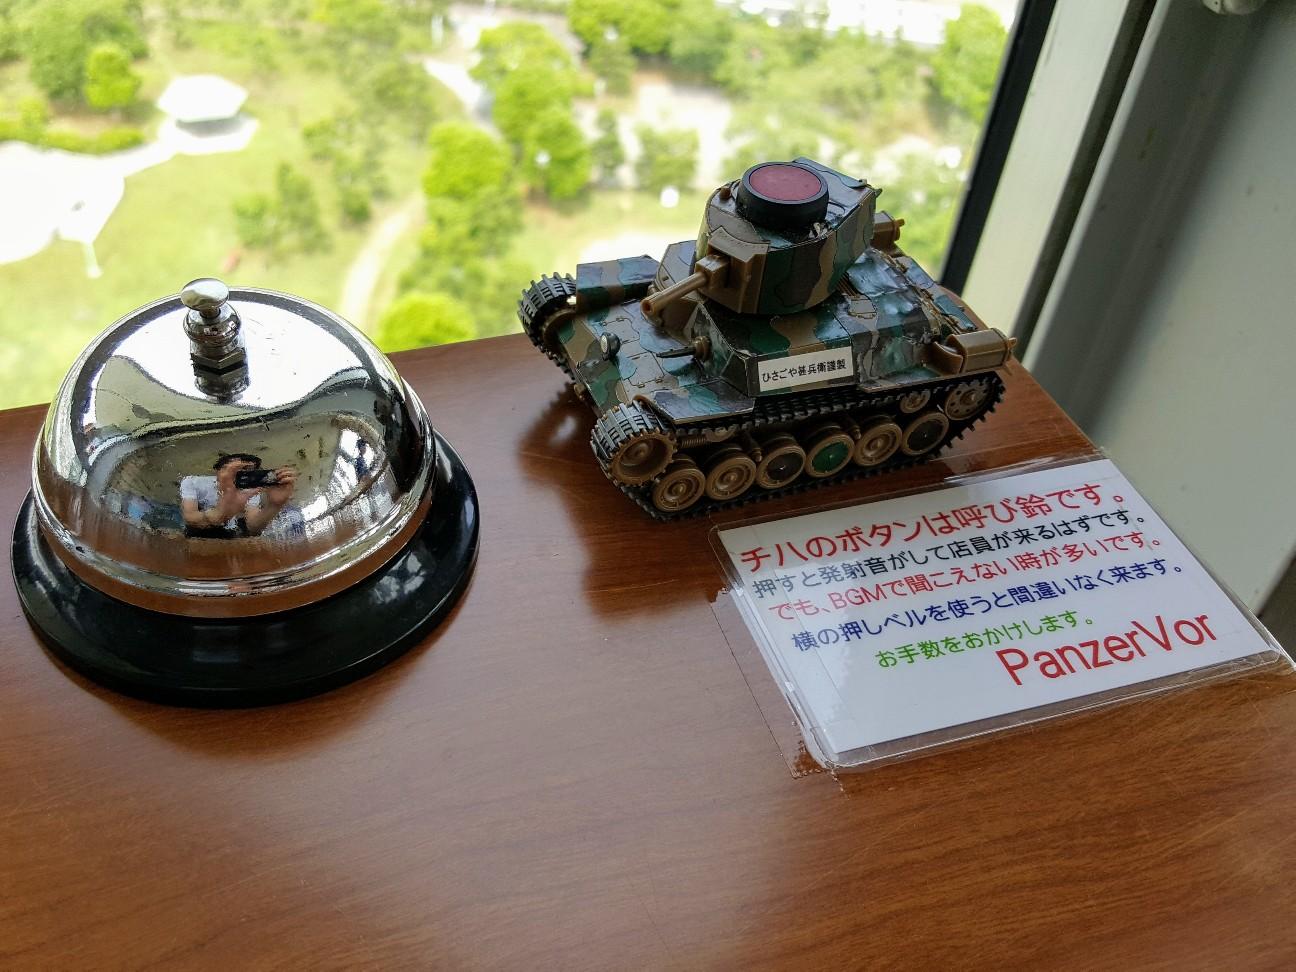 f:id:tokuda-hirofumi:20170704164424j:image